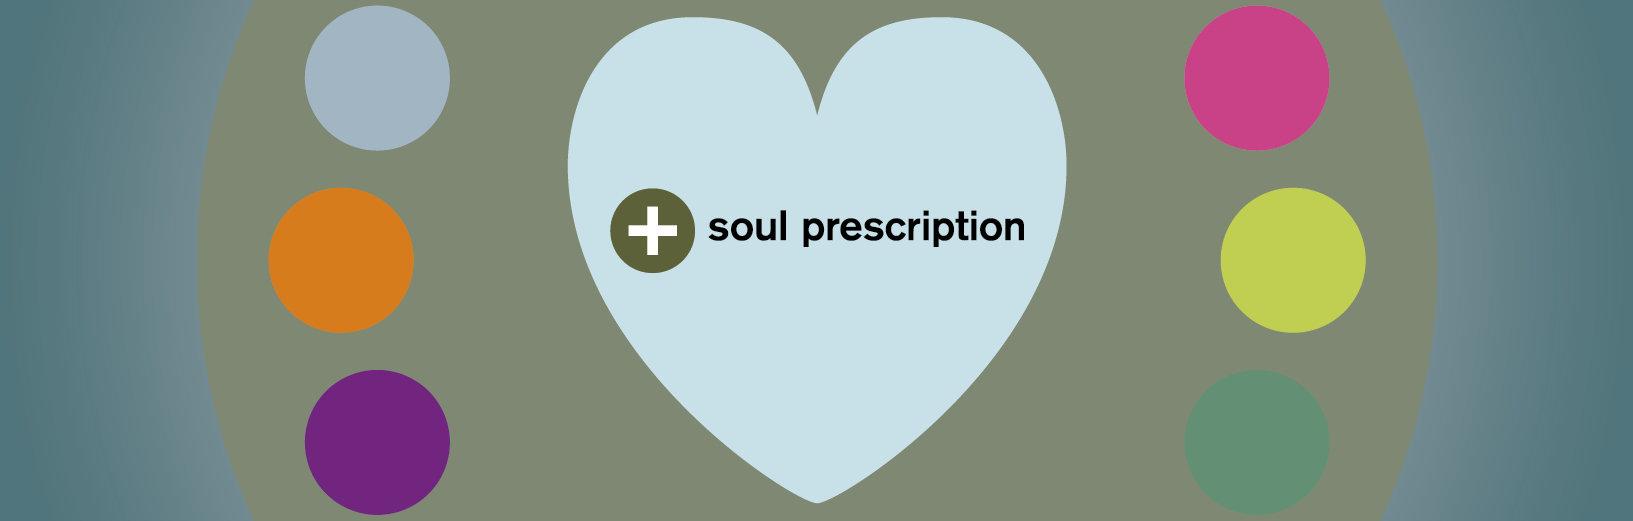 Soul Prescription January 2020 flyer